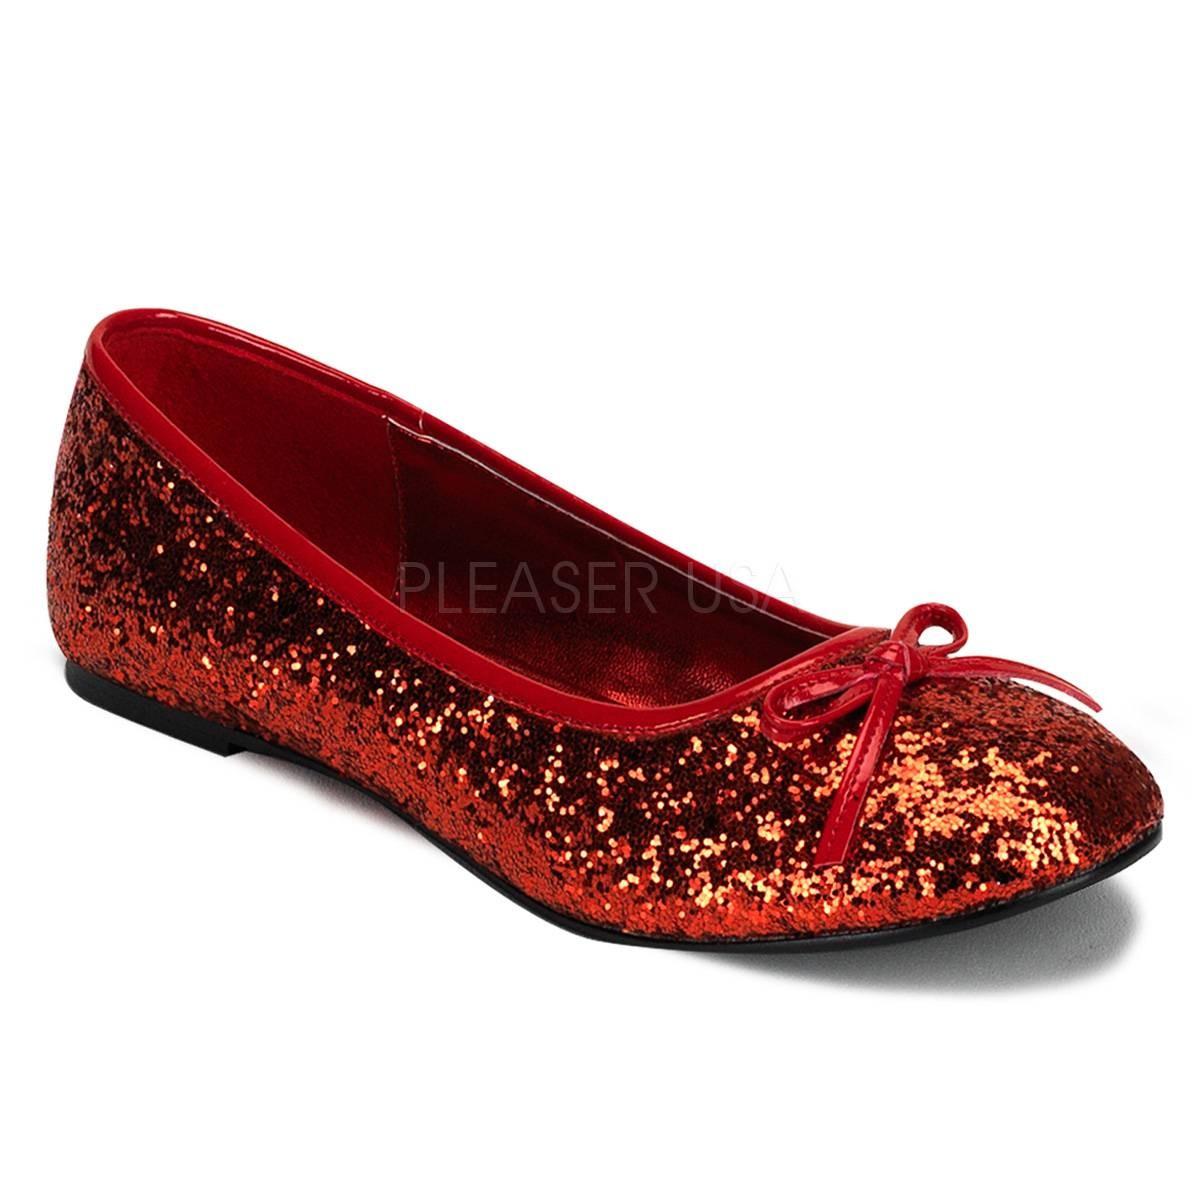 Ballerinas - STAR 16G ° Damen Ballerina ° Rot Glitter ° Funtasma  - Onlineshop RedSixty